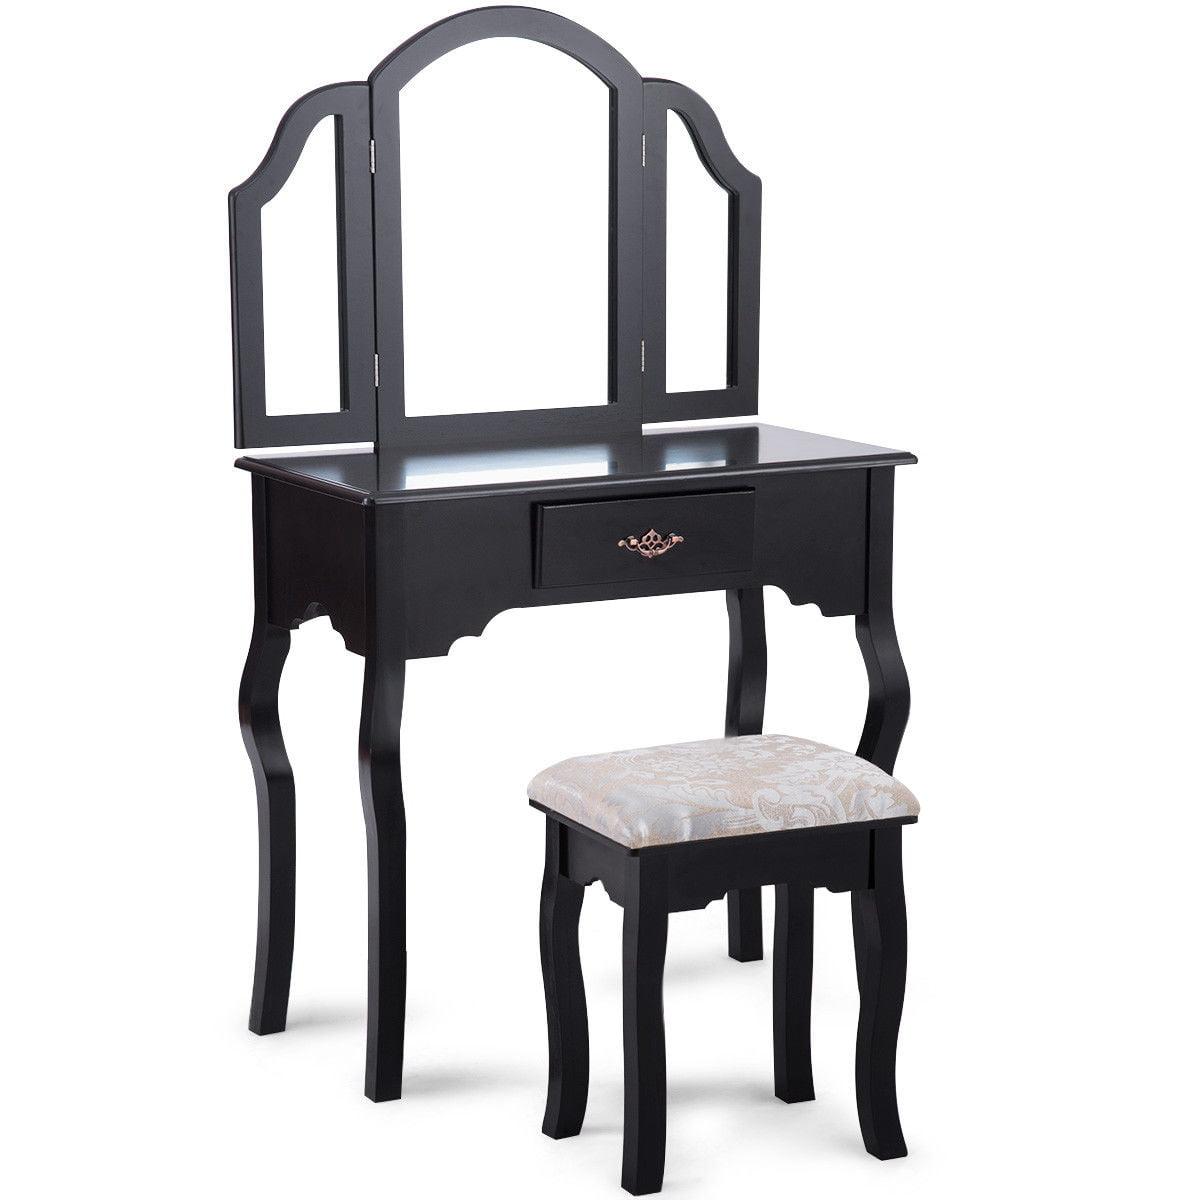 Costway Vanity Table Set Makeup Dressing Table Cushioned Stool Mirror Wood Furniture